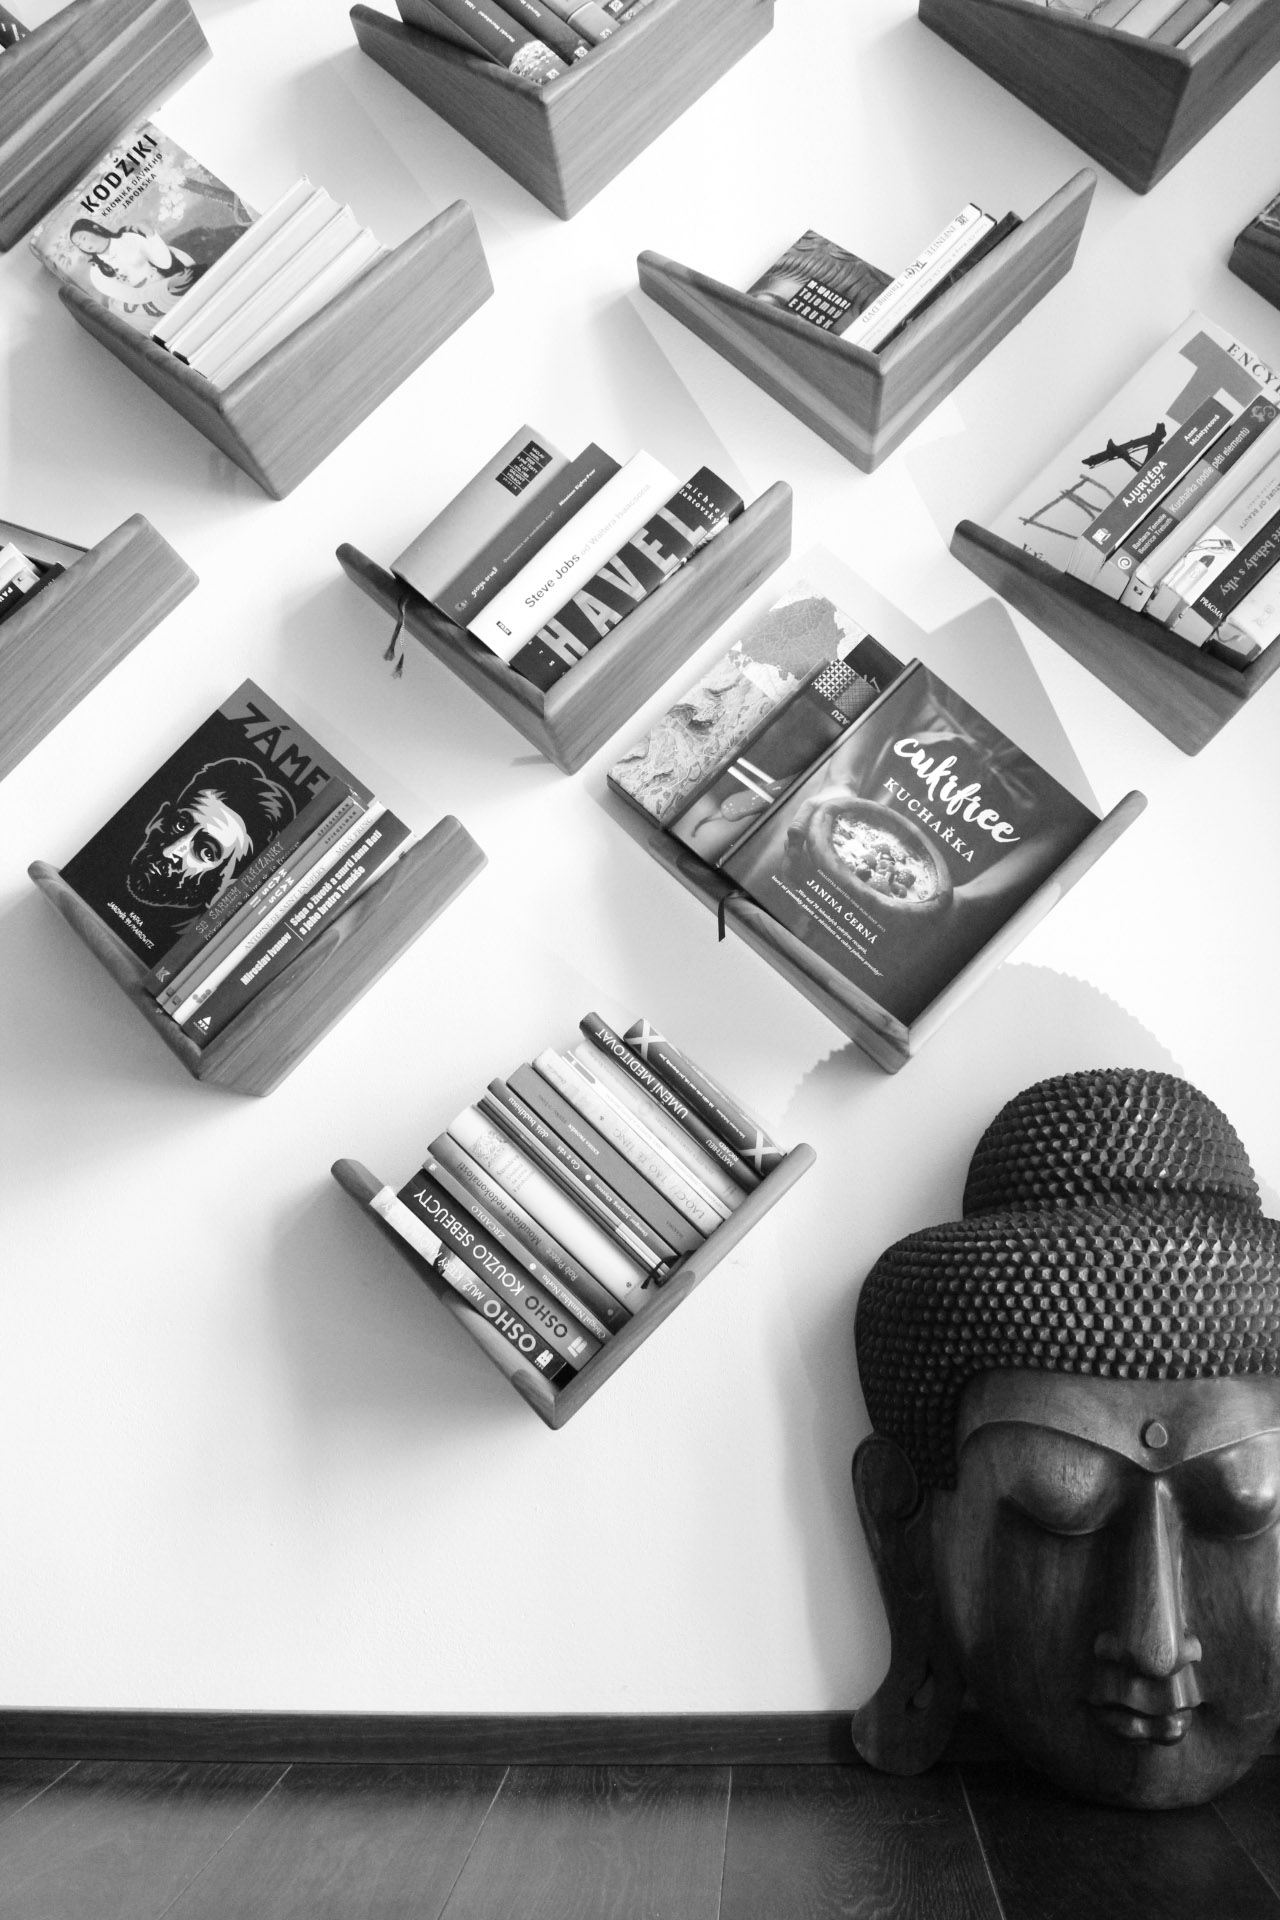 Bookshelf Regina